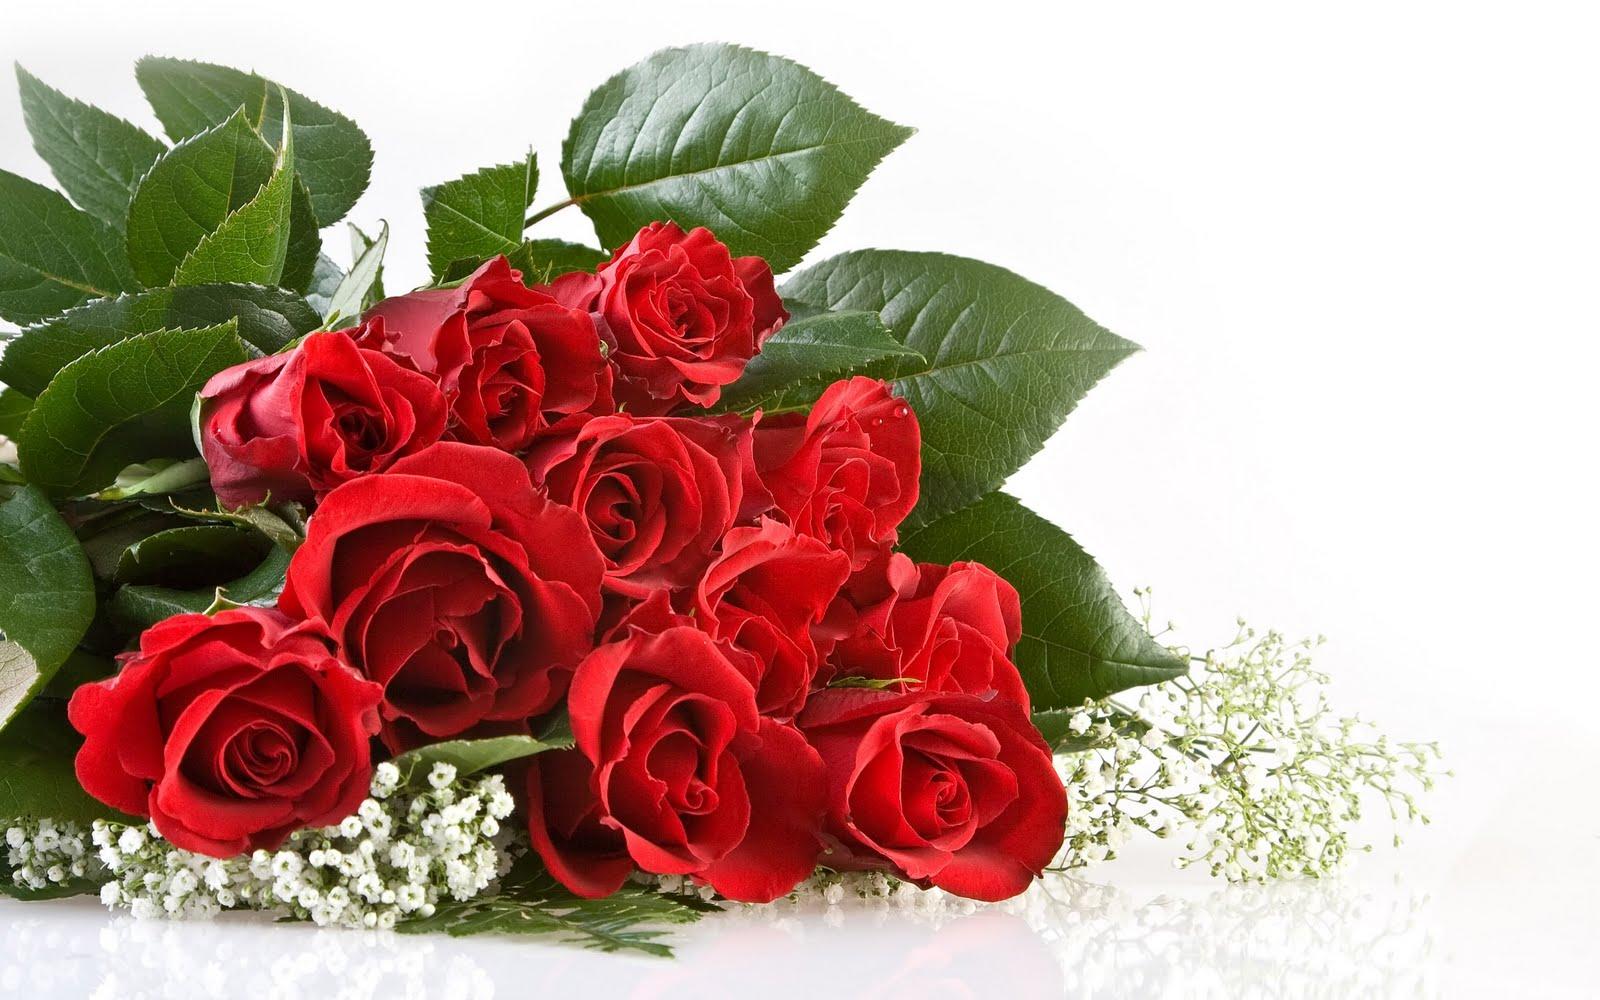 44. Gönülçelen -Inima furata - Heart Stealer - General Discussions - Comentarii - Pagina 40 Buchet_trandafiri_rosi